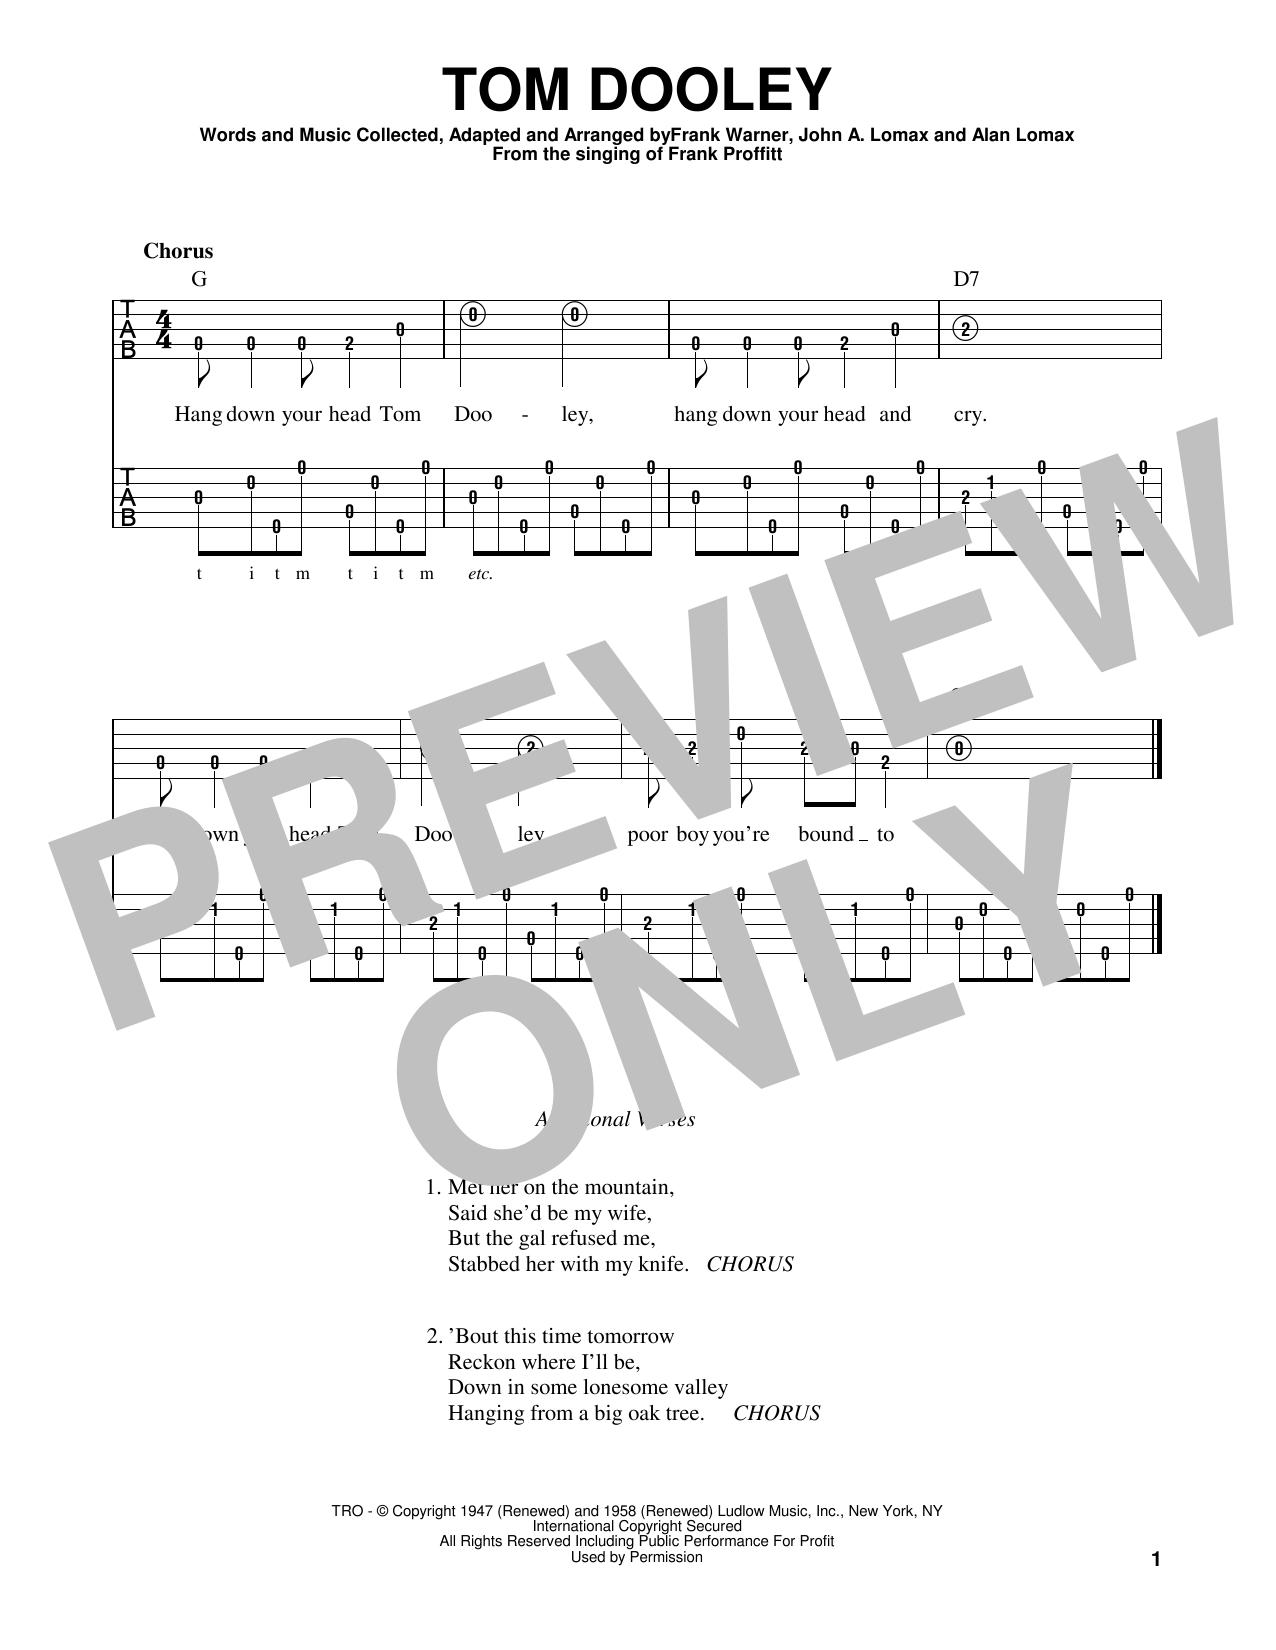 Tom Dooley (Banjo Tab)